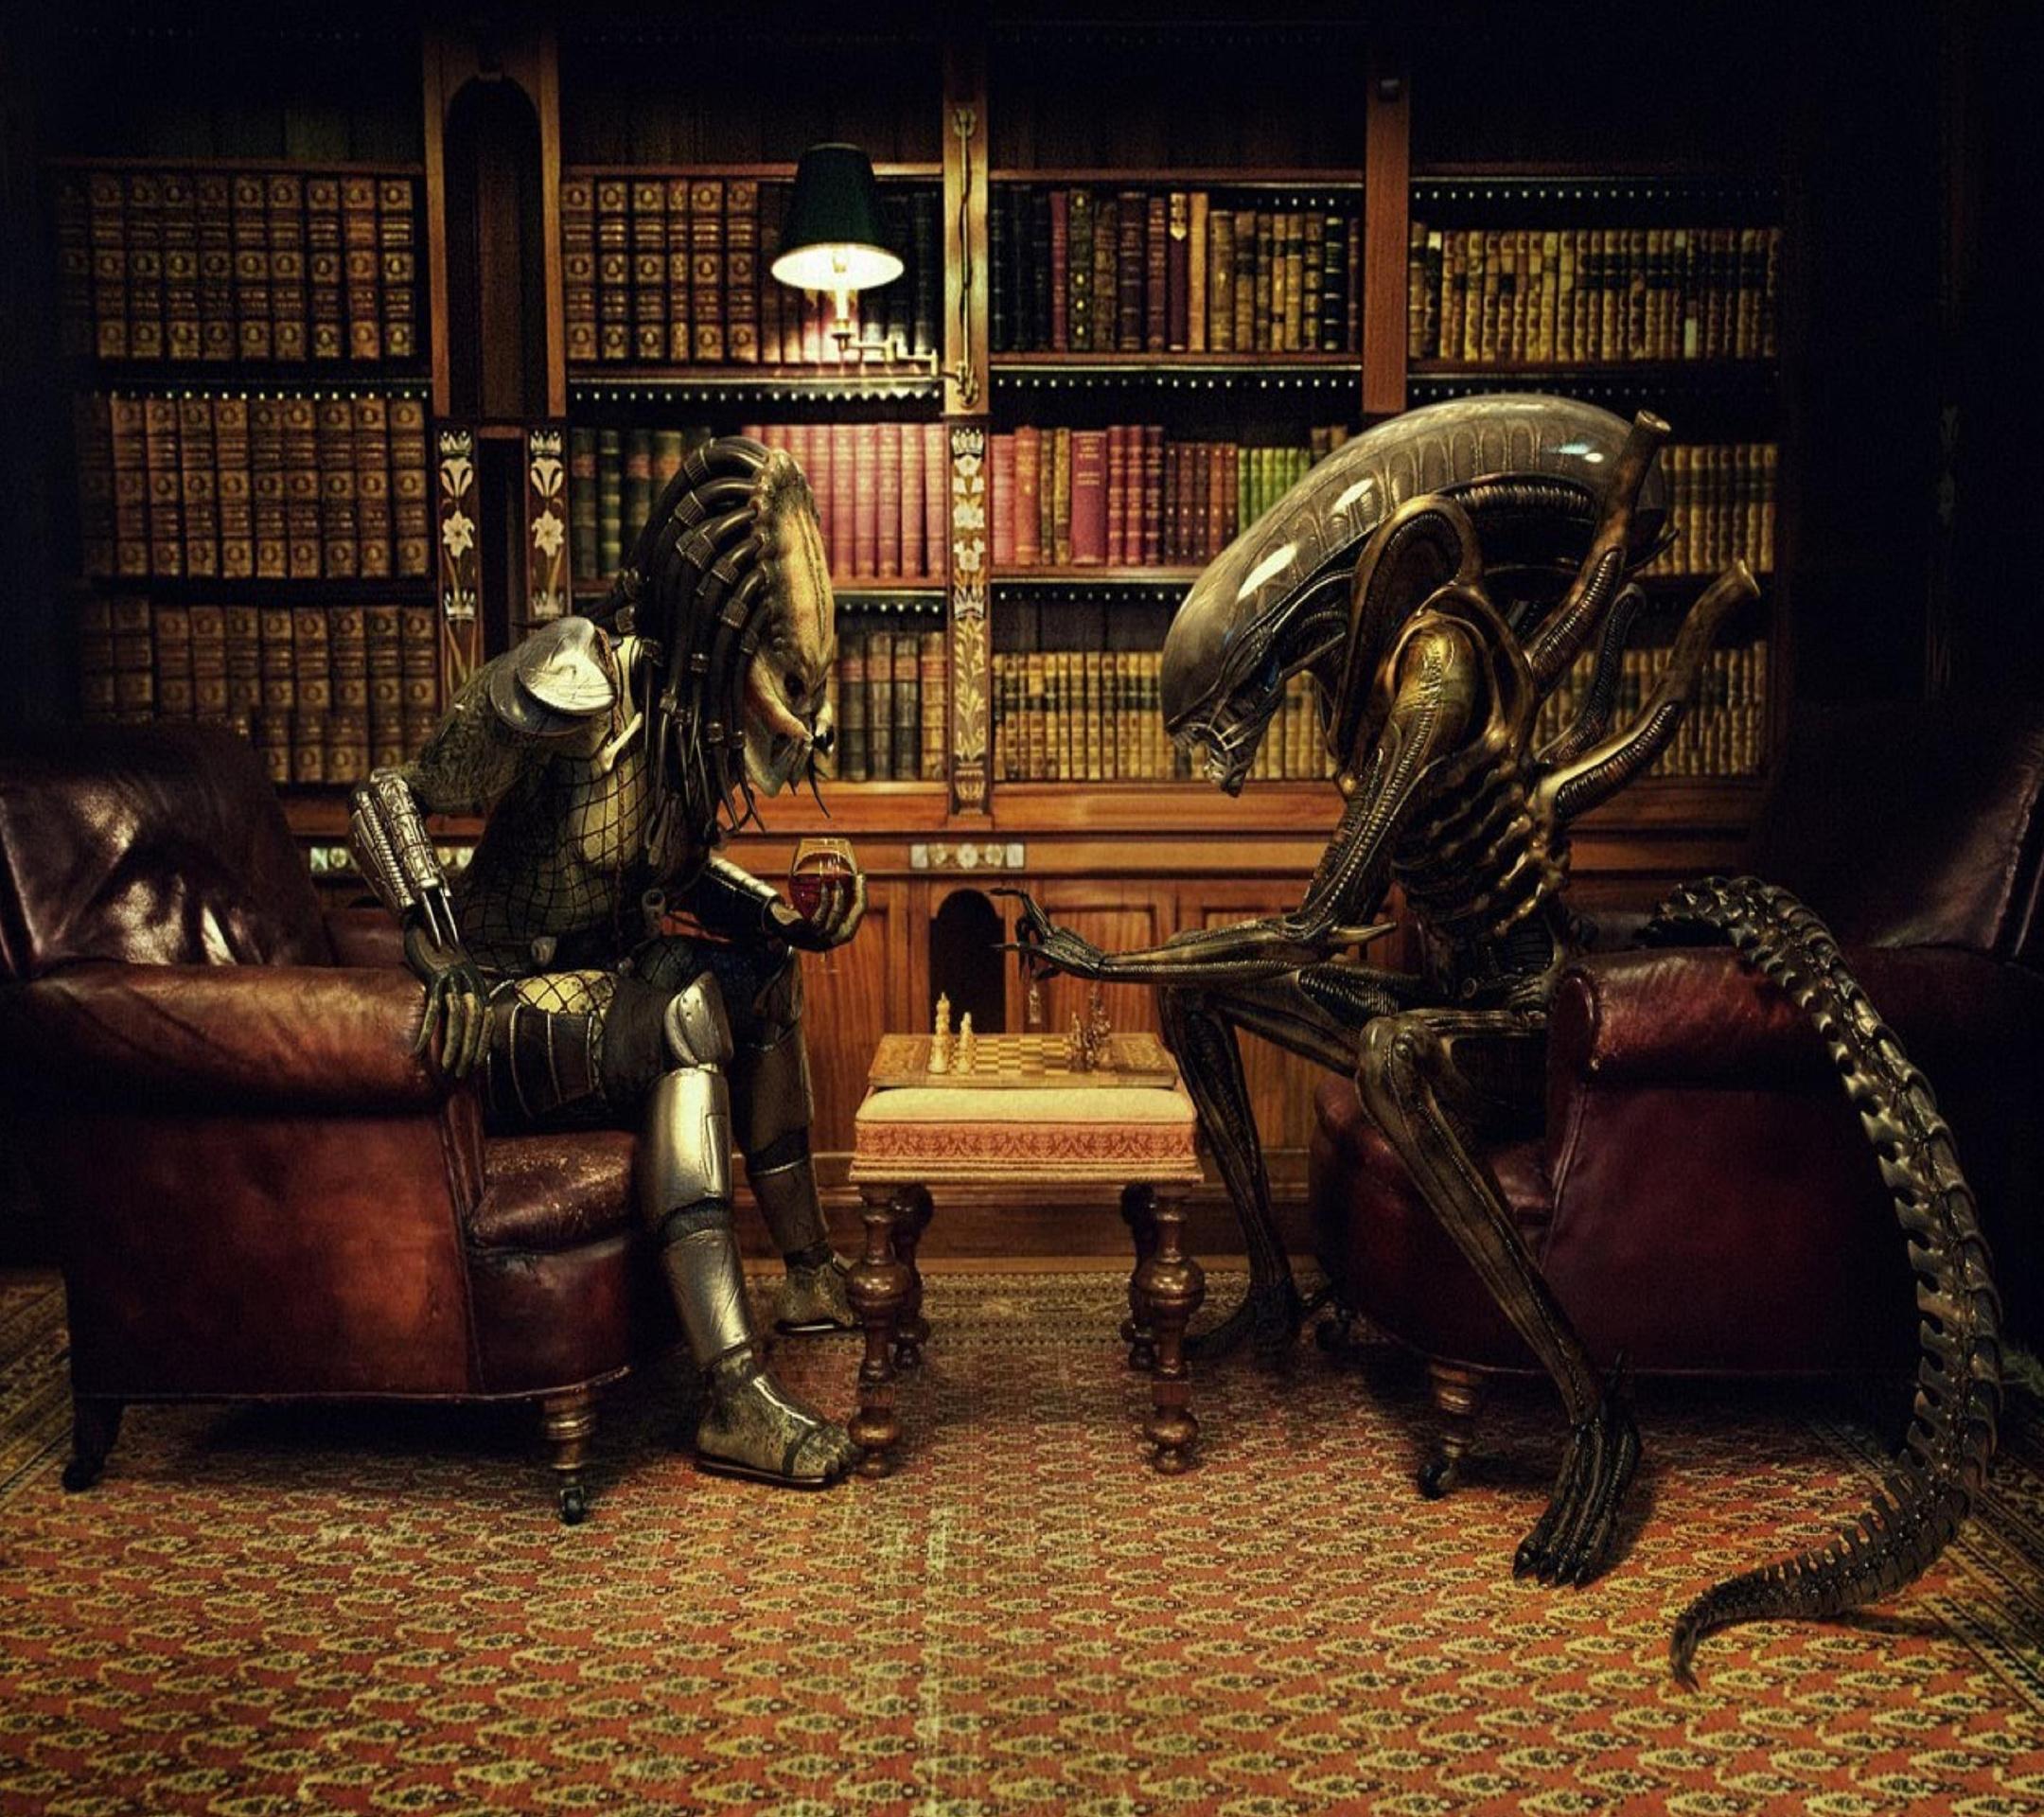 Alien vs Predator wallpaper 10701328